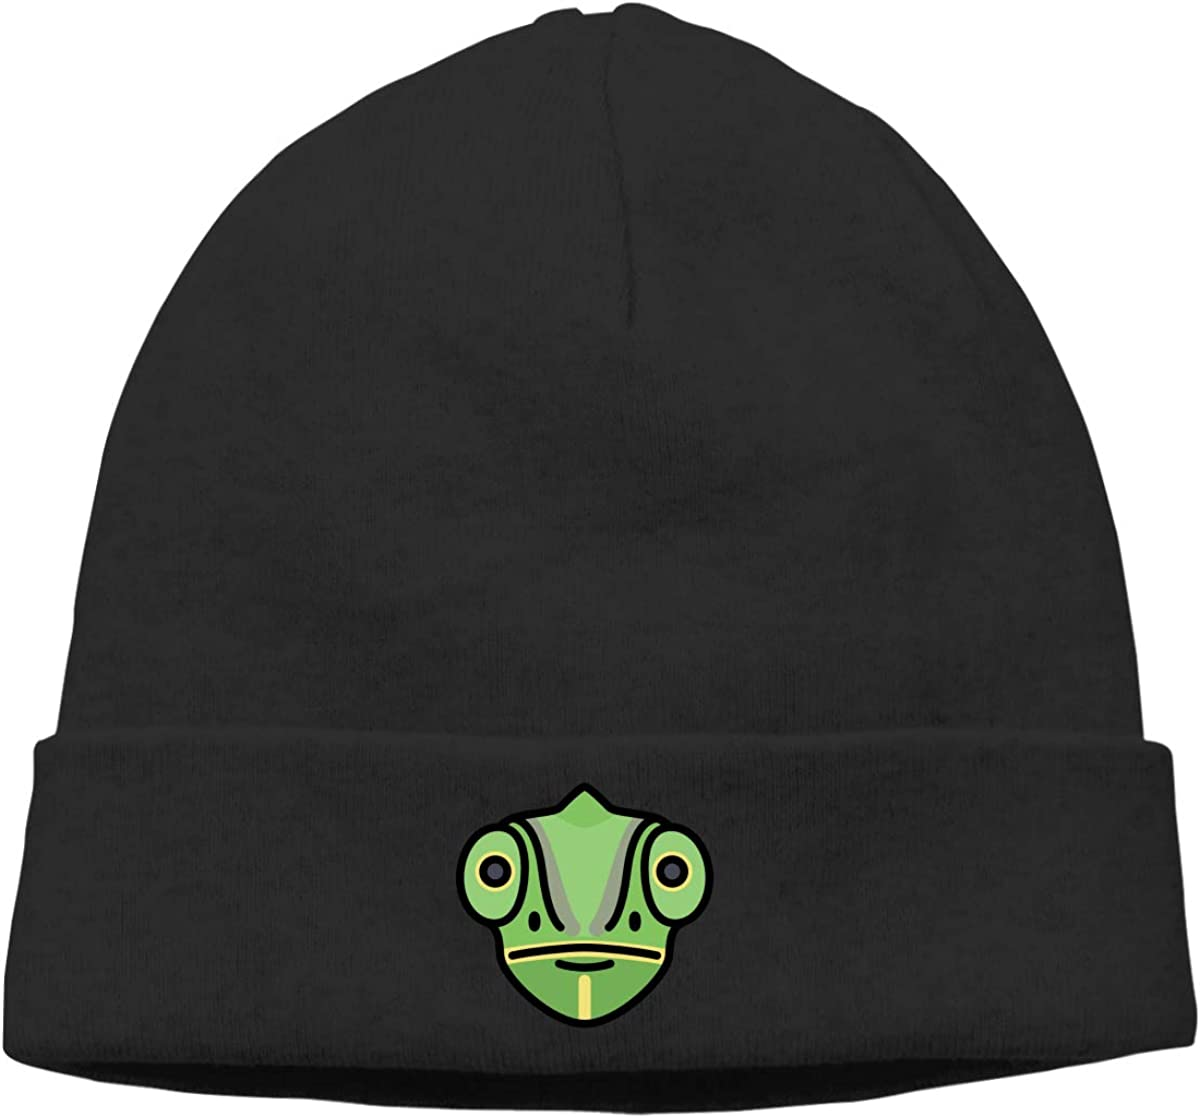 Chameleon Cap Men Women Warm /& Stylish Knit Hat Cap Winter Hats